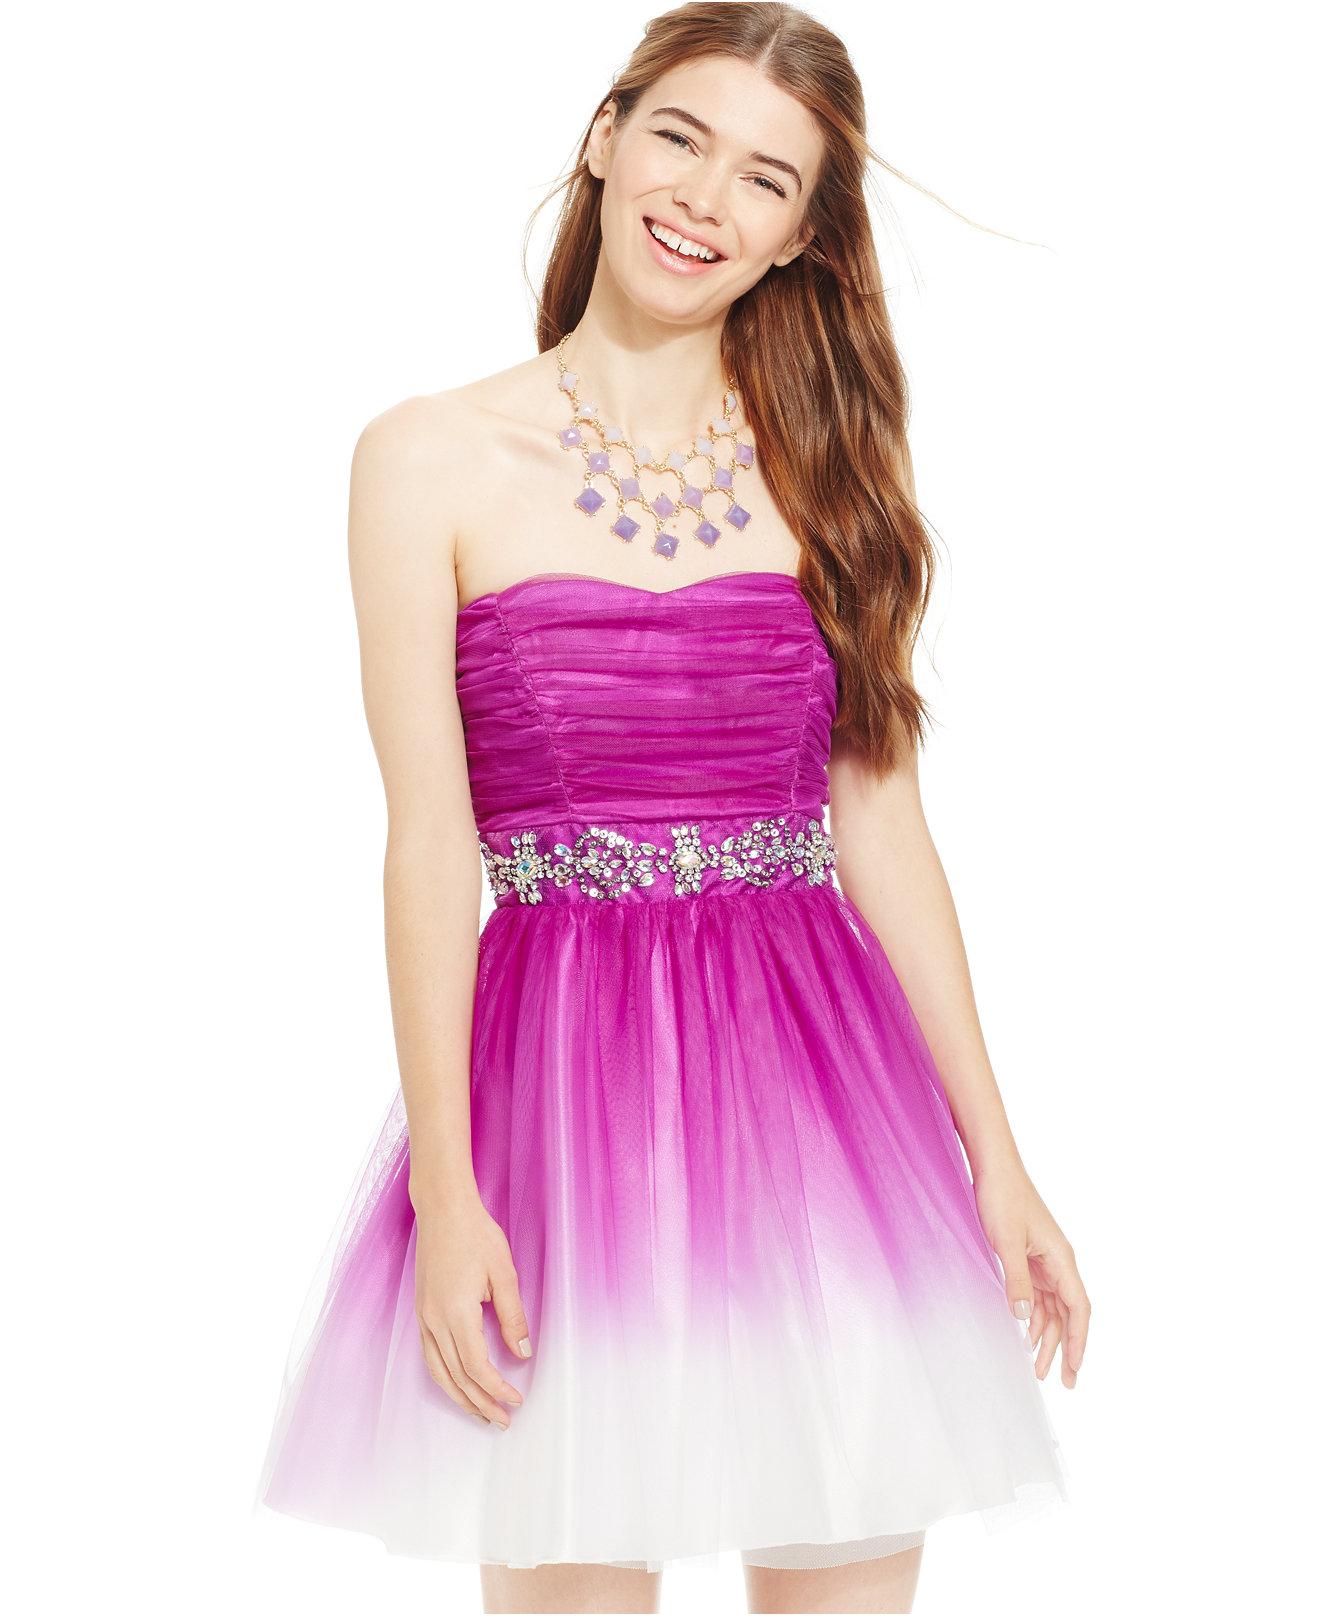 B Darlin Homecoming Dresses - Boutique Prom Dresses